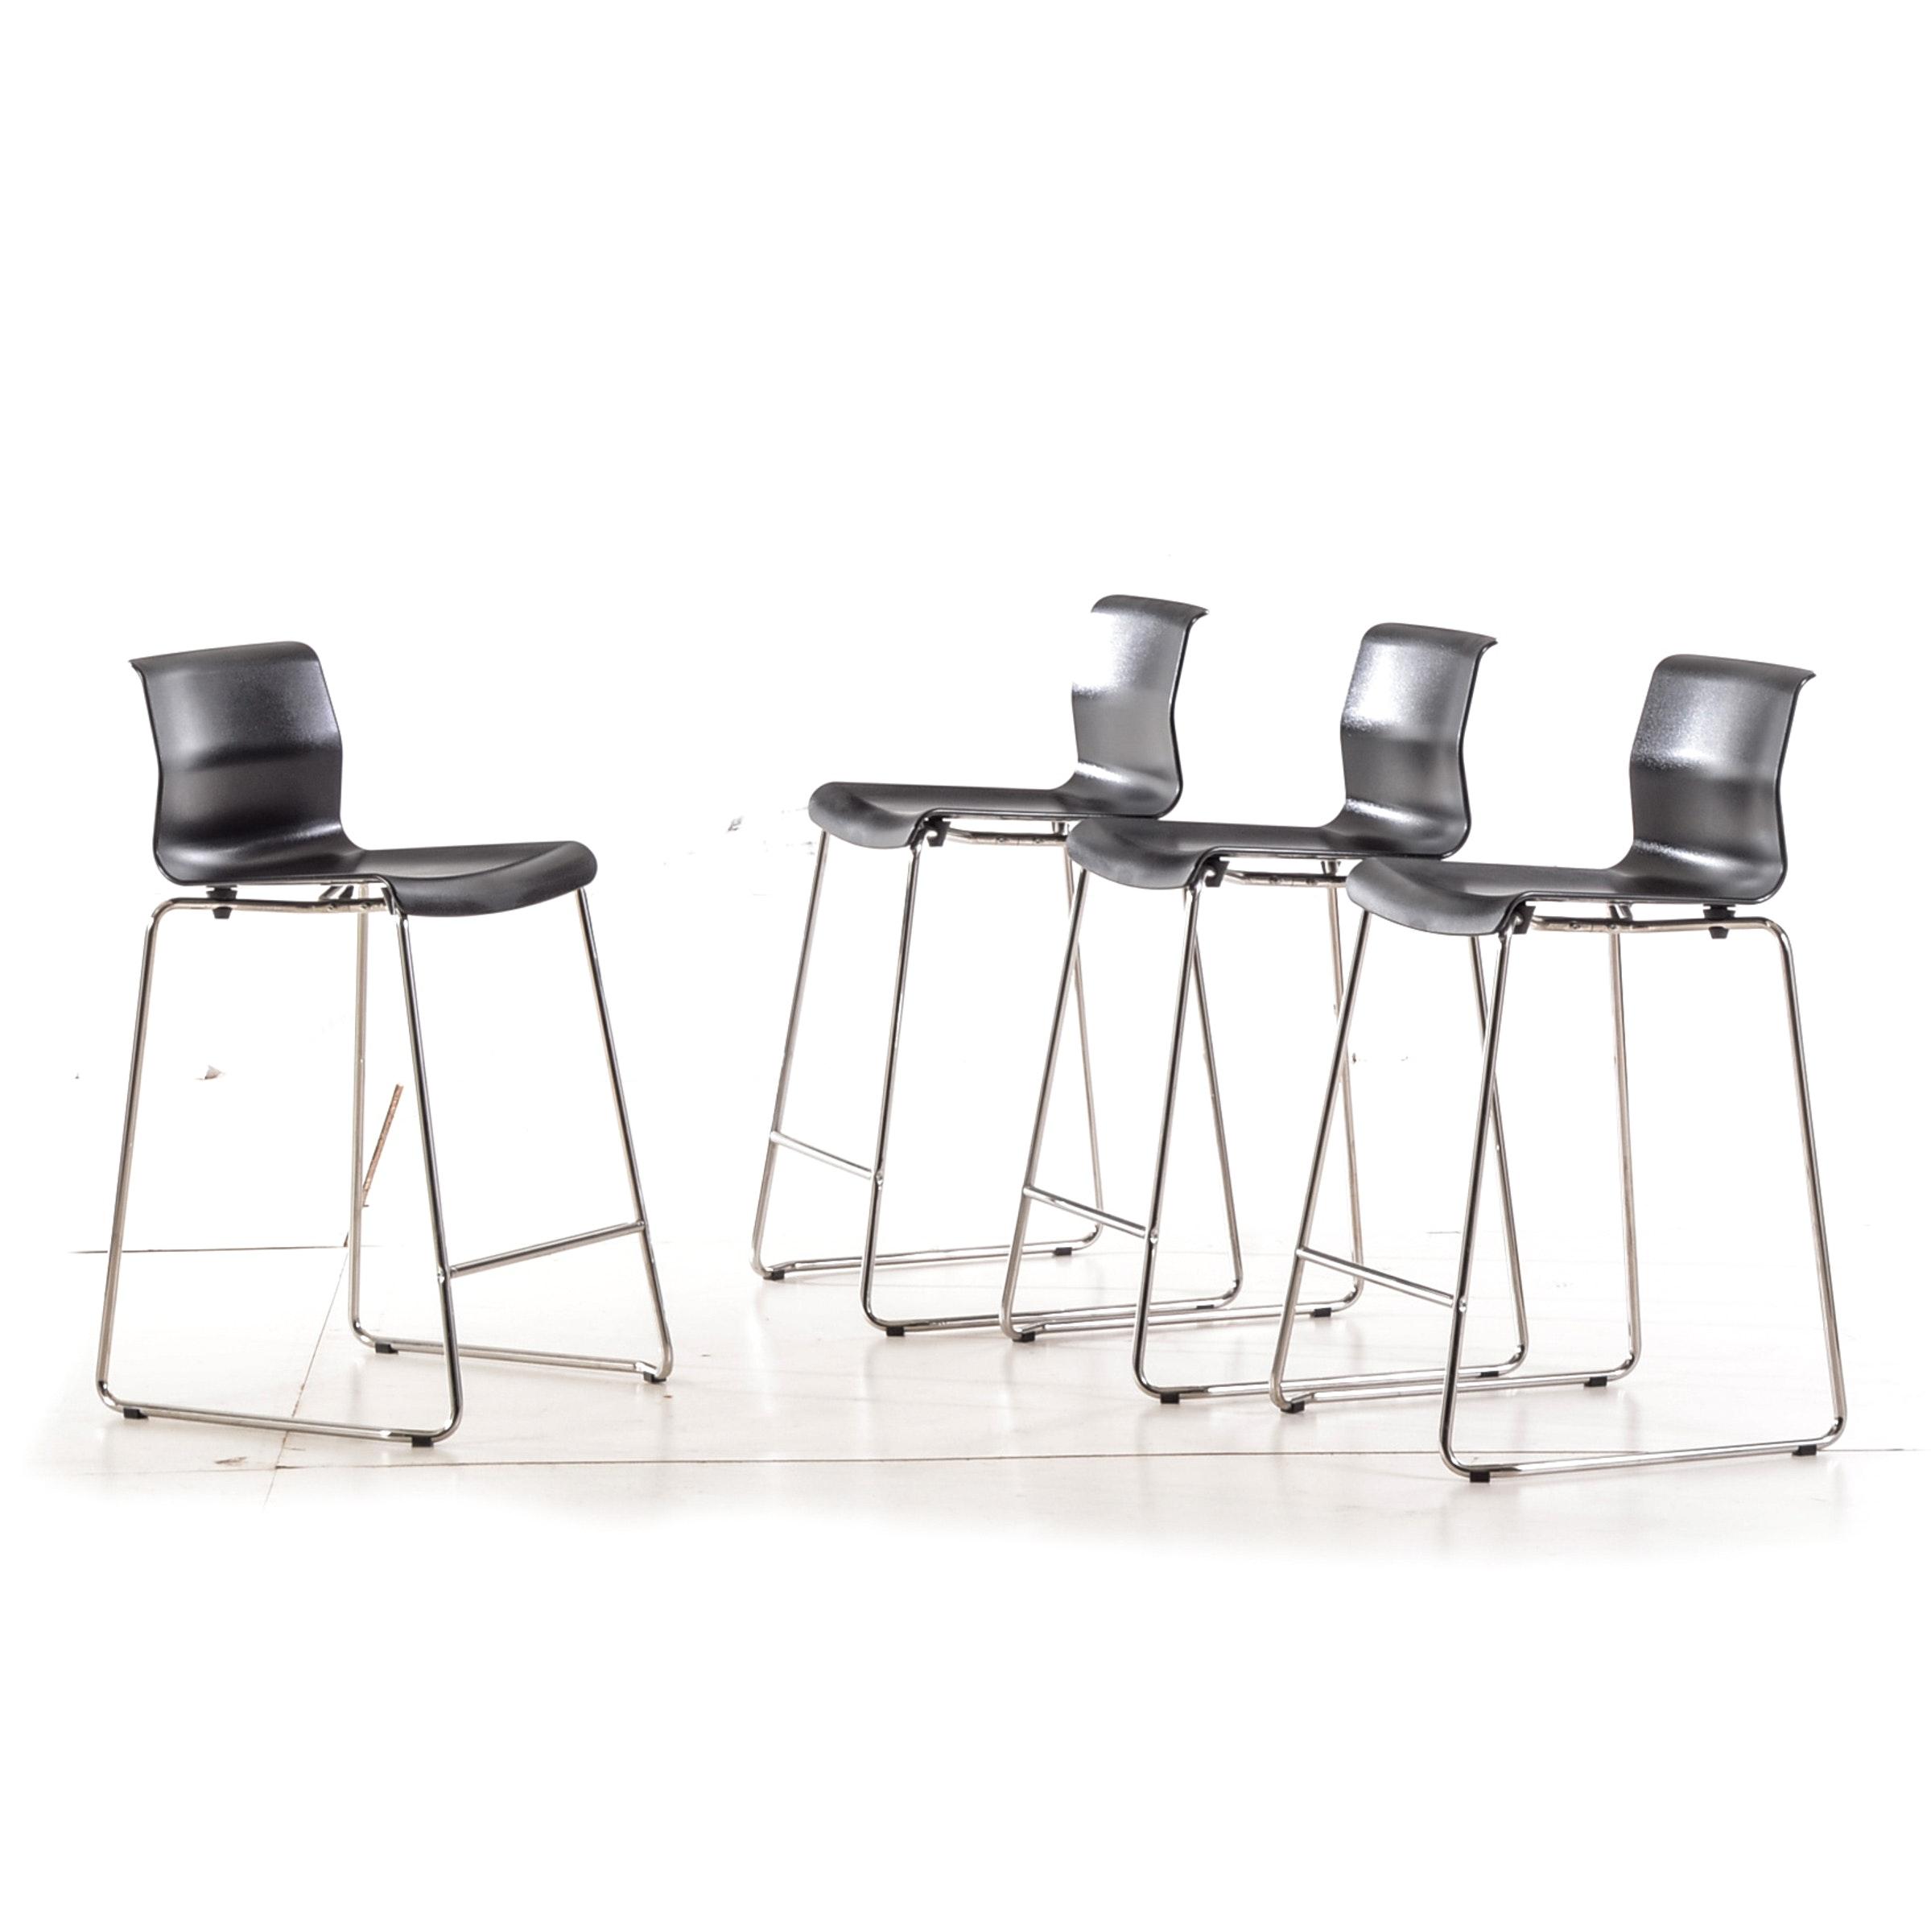 "Four Ikea ""Glenn"" Bar Stools"